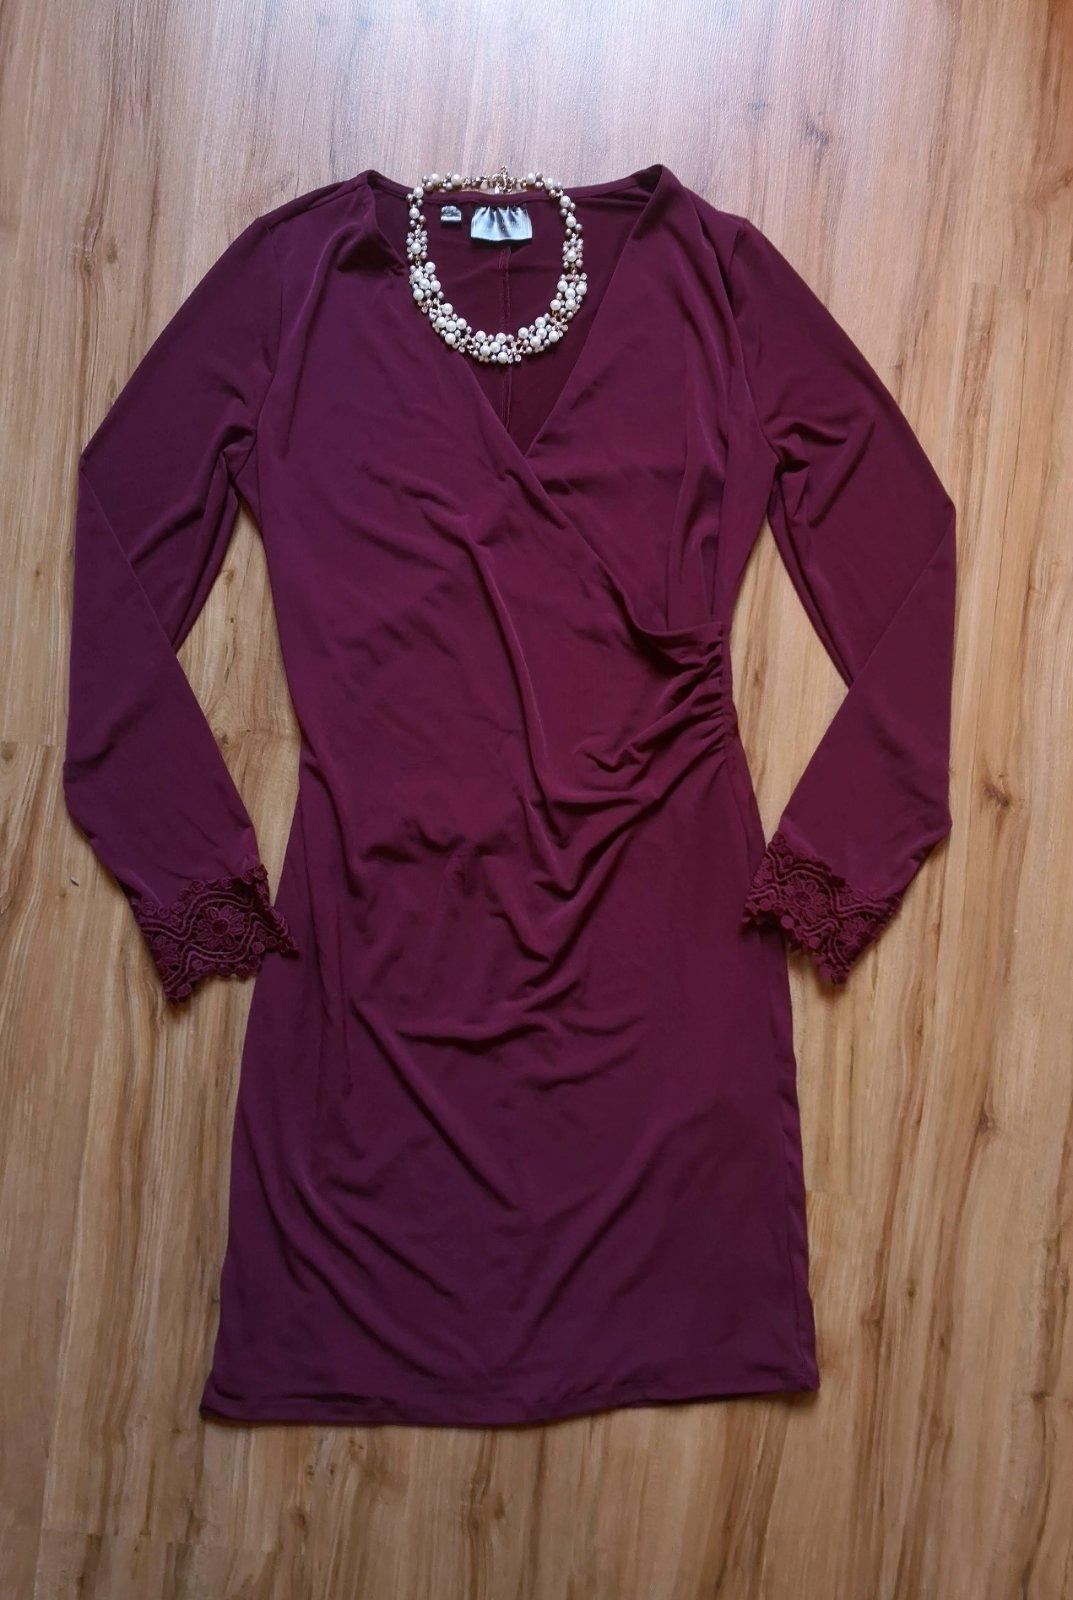 šaty s ozdobnými rukávmi - Obrázok č. 1